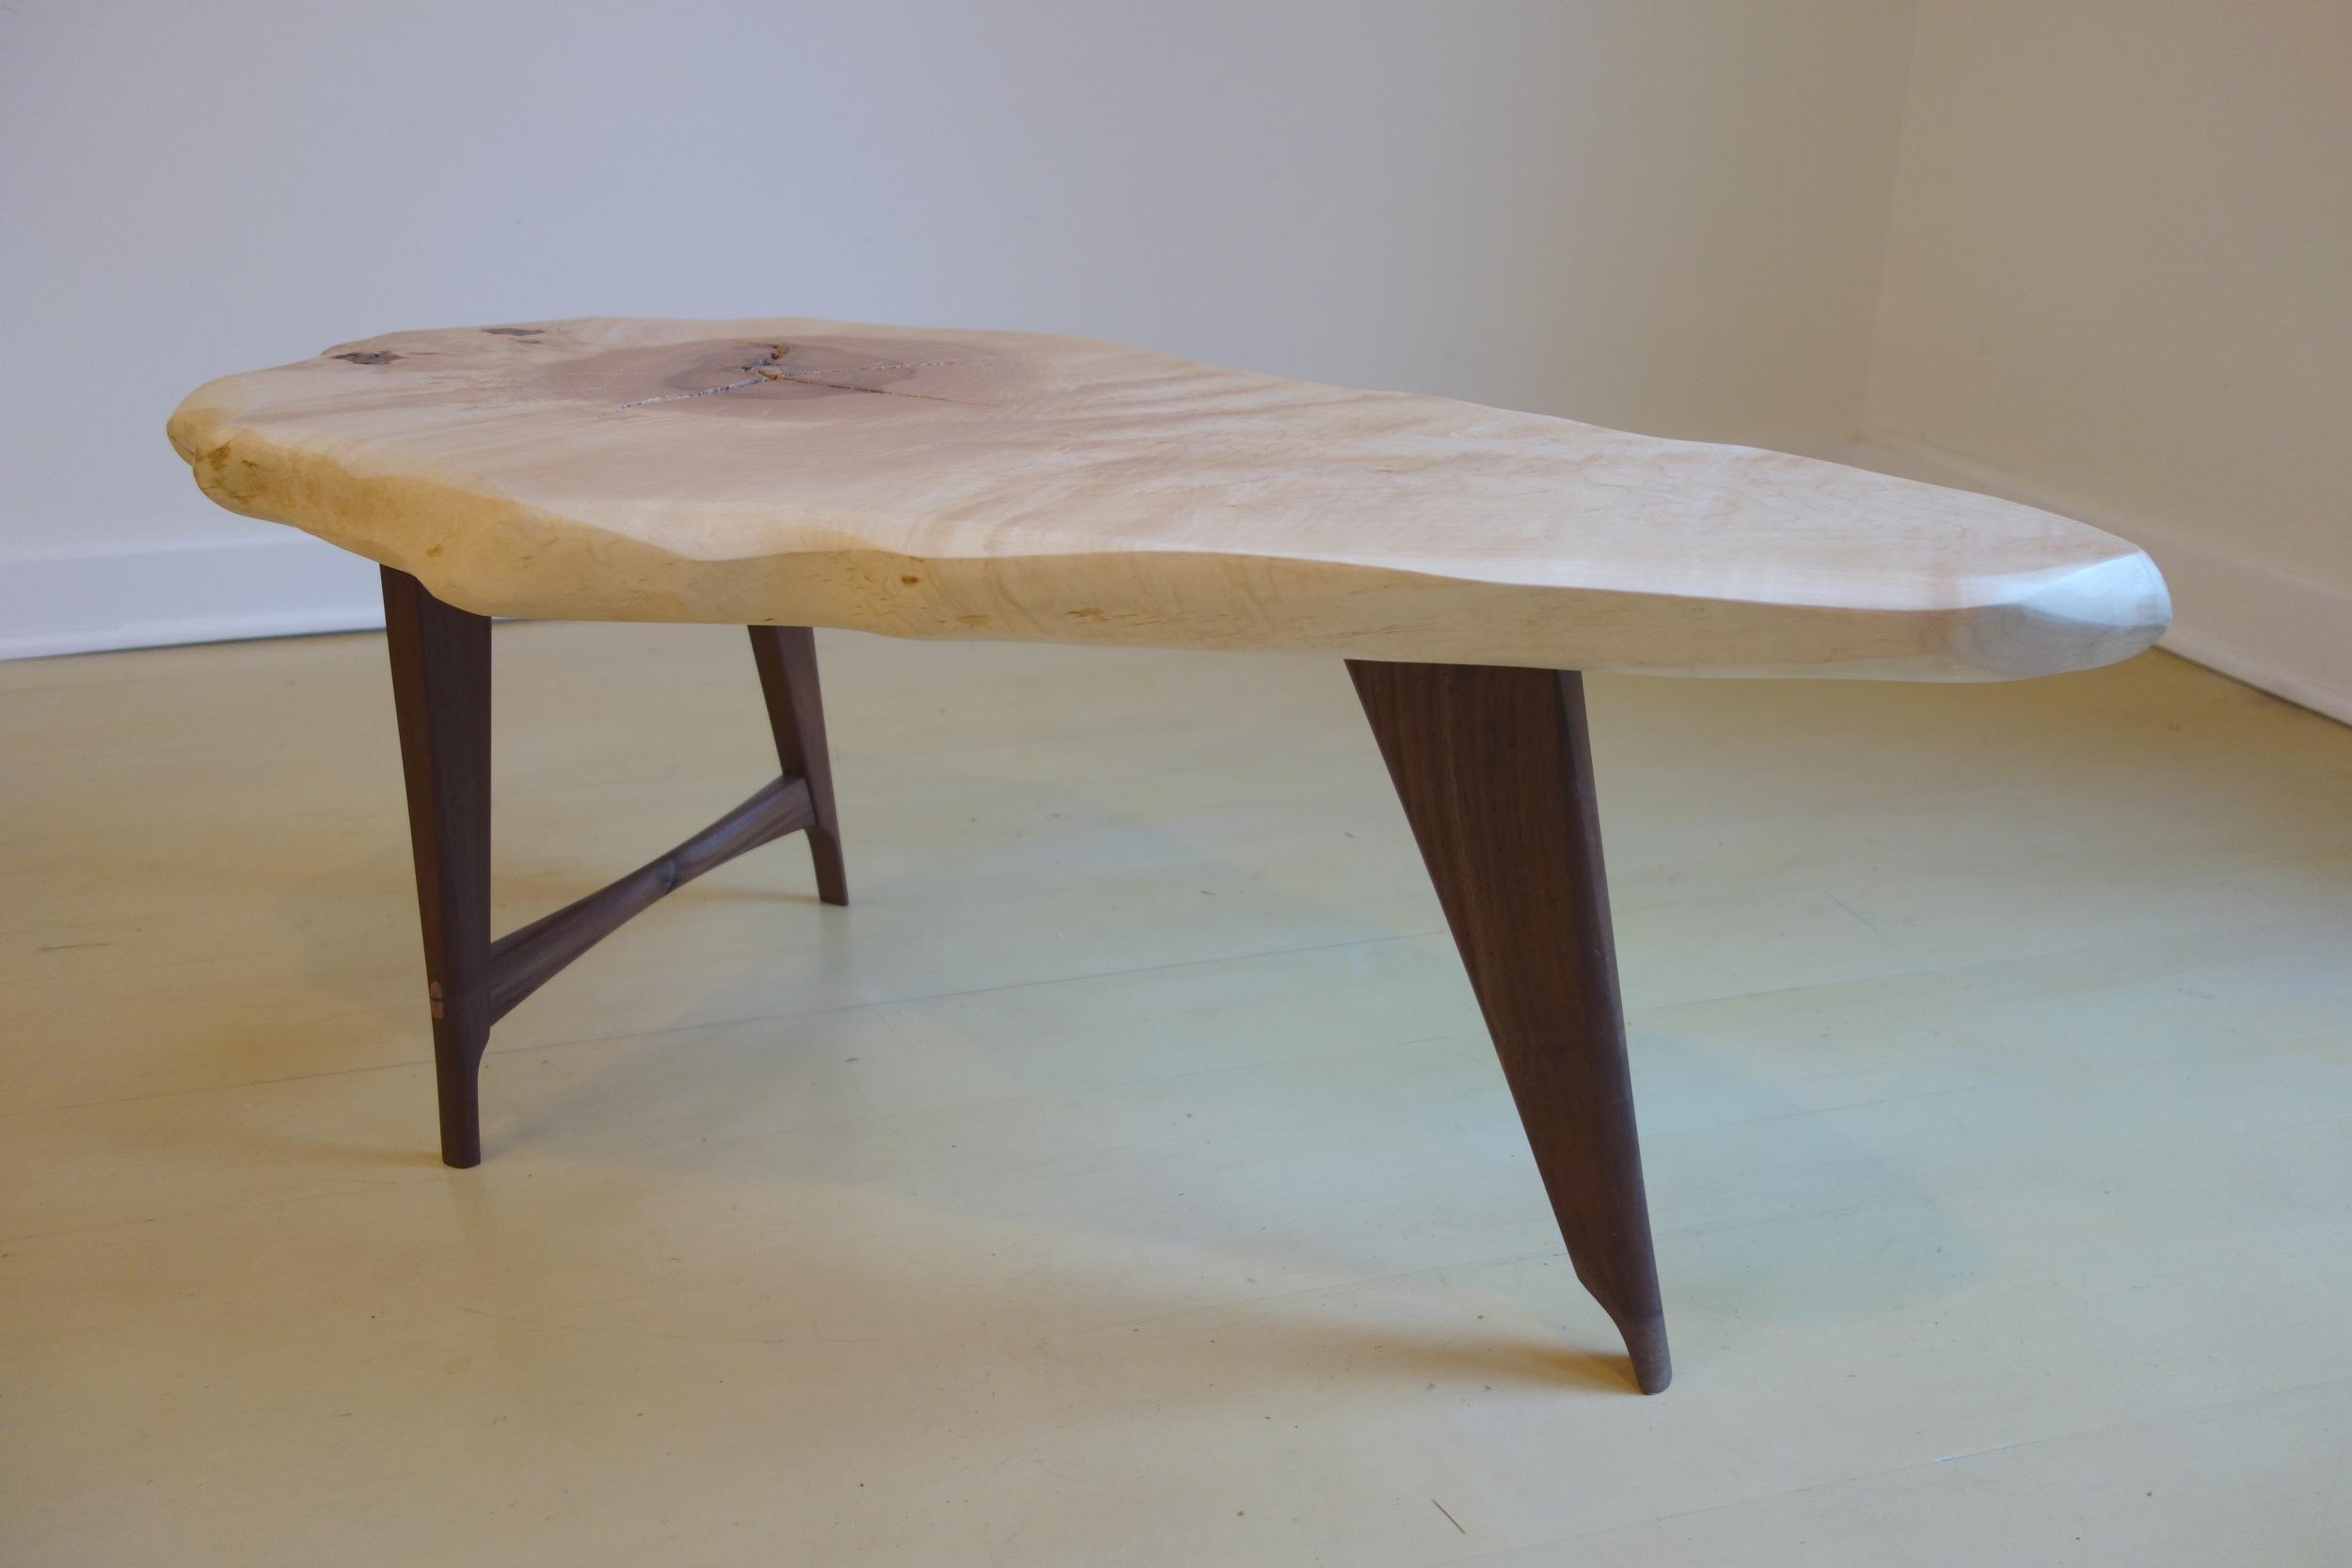 Johnny_A_Williams_Peninsula_Coffee_Table_2.JPG